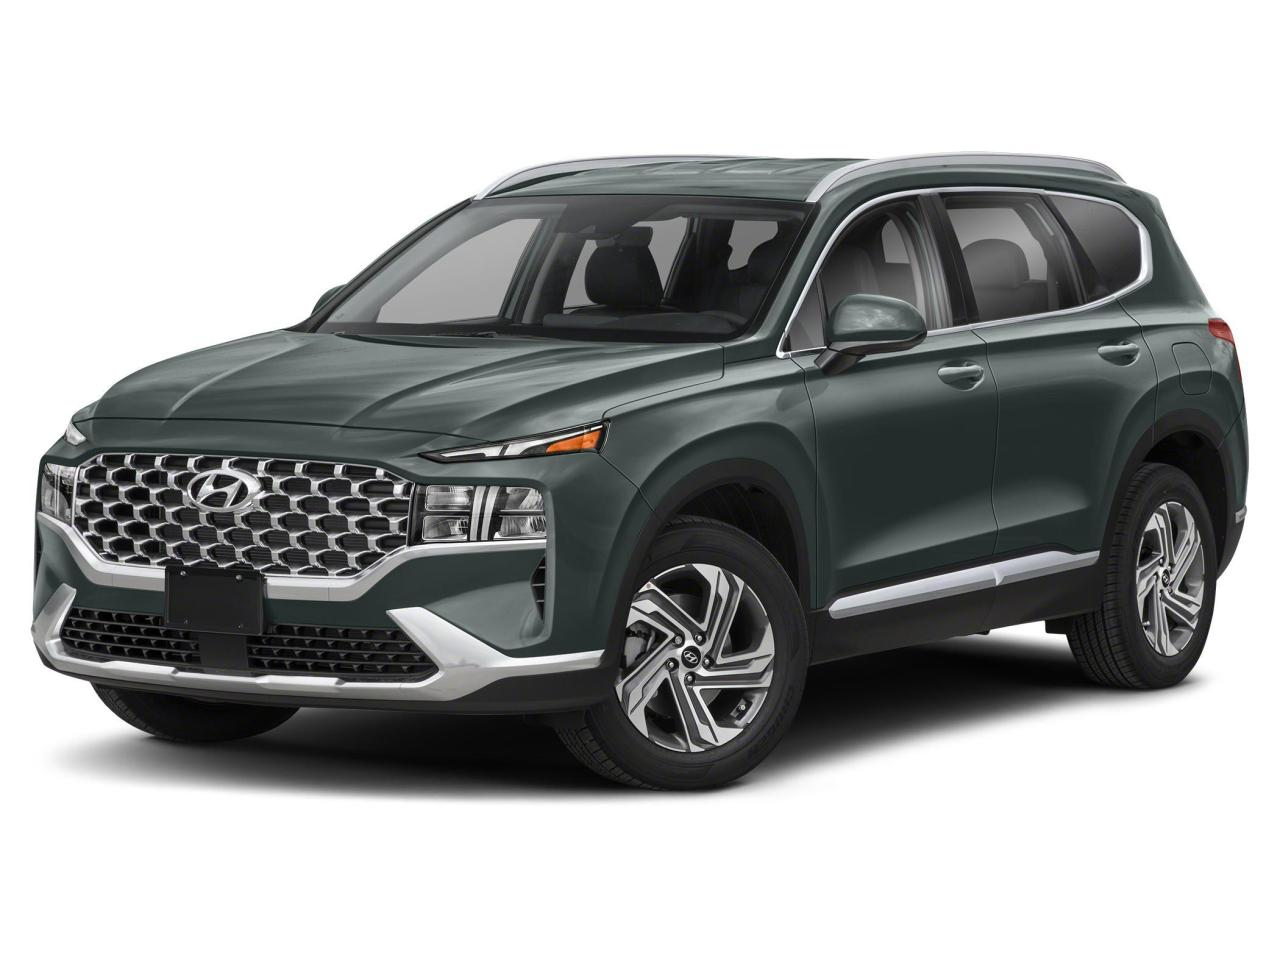 2021 Hyundai Santa Fe 2.5L PREFERRED AWD NO OPTIONS